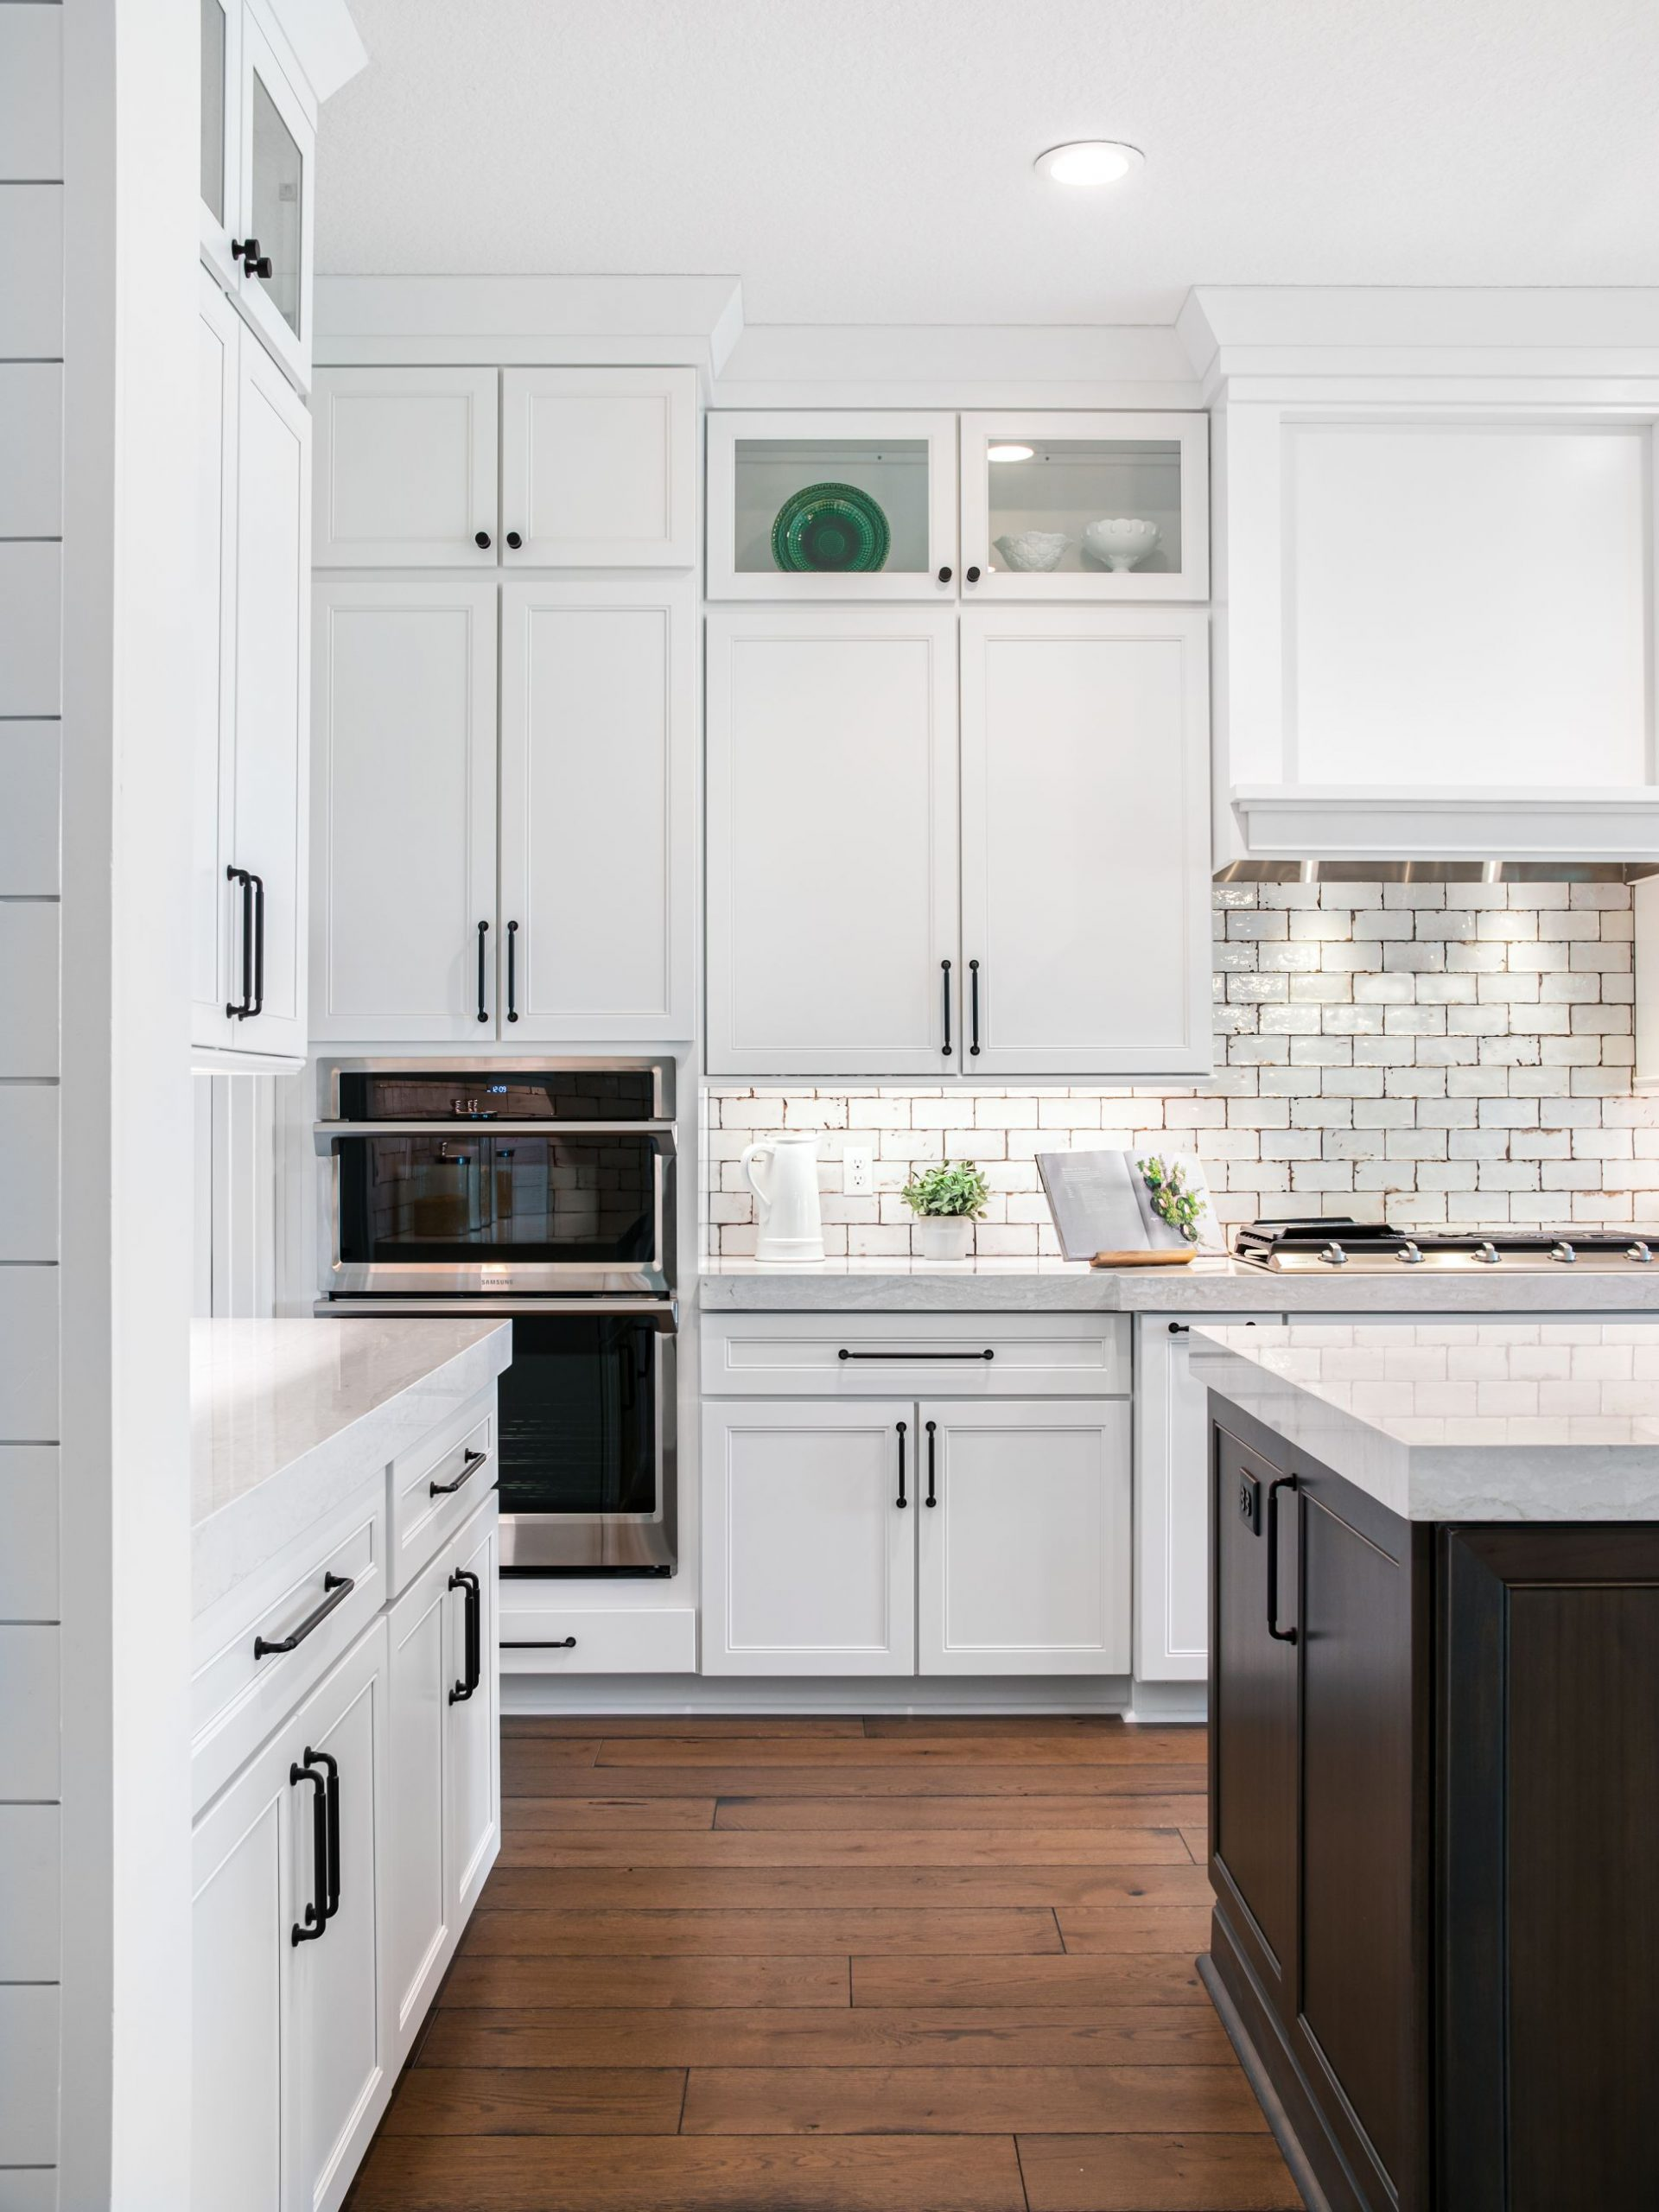 Aspect Landes Maple Tundra Kitchen Cabinets